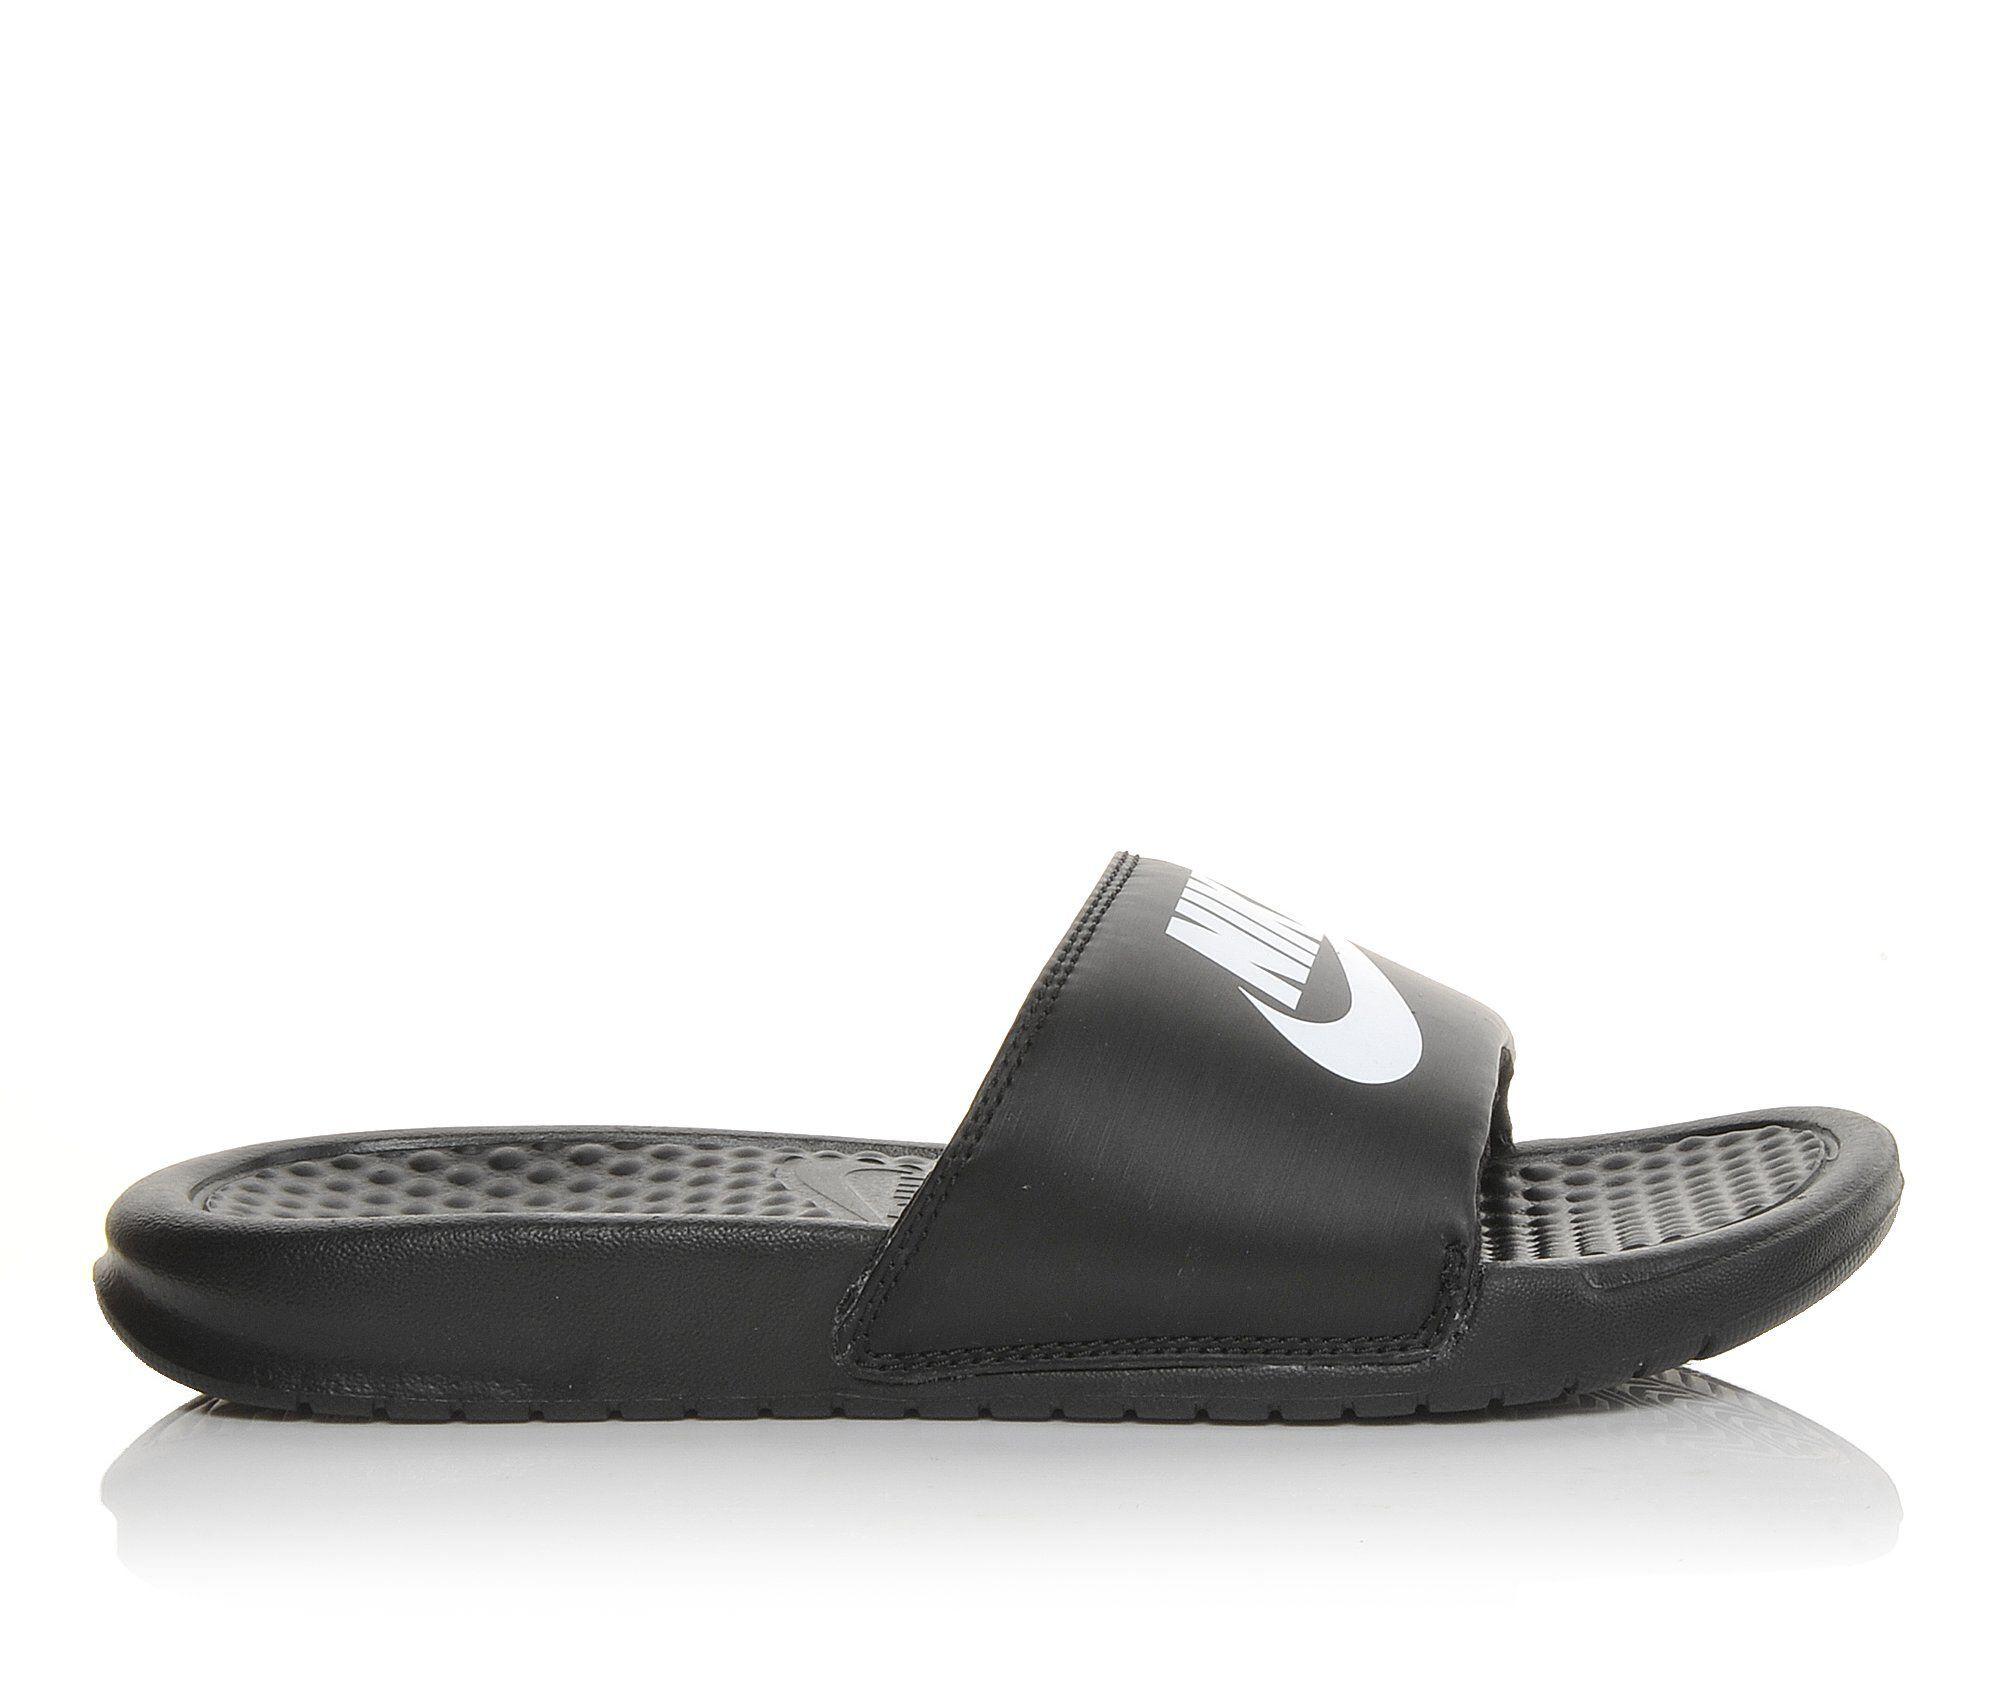 39053e3aa003f2 adidas sandals kids 2014 Sale